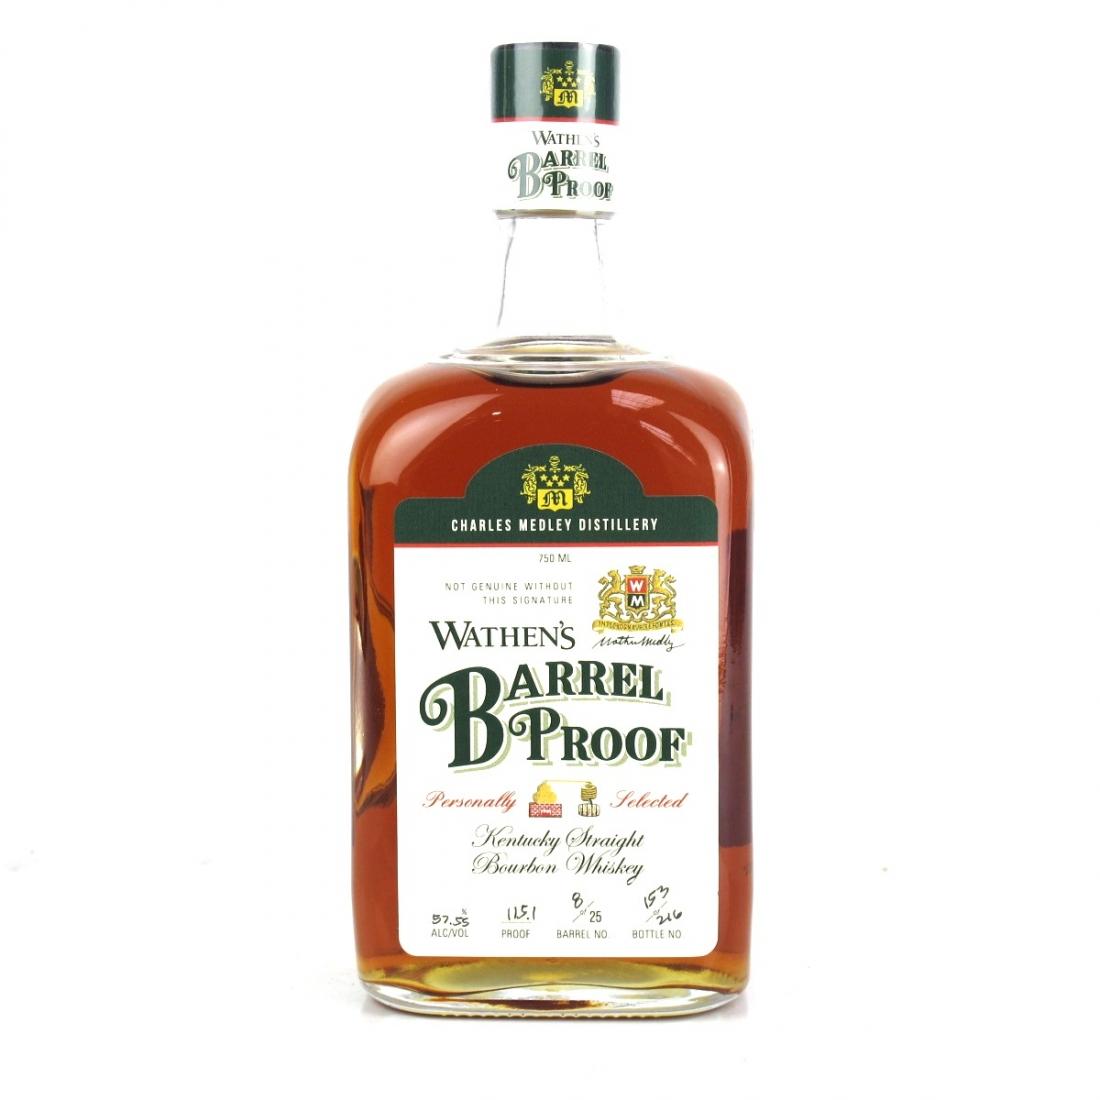 Wathen's Barrel Proof Kentucky Bourbon / State of Oregon